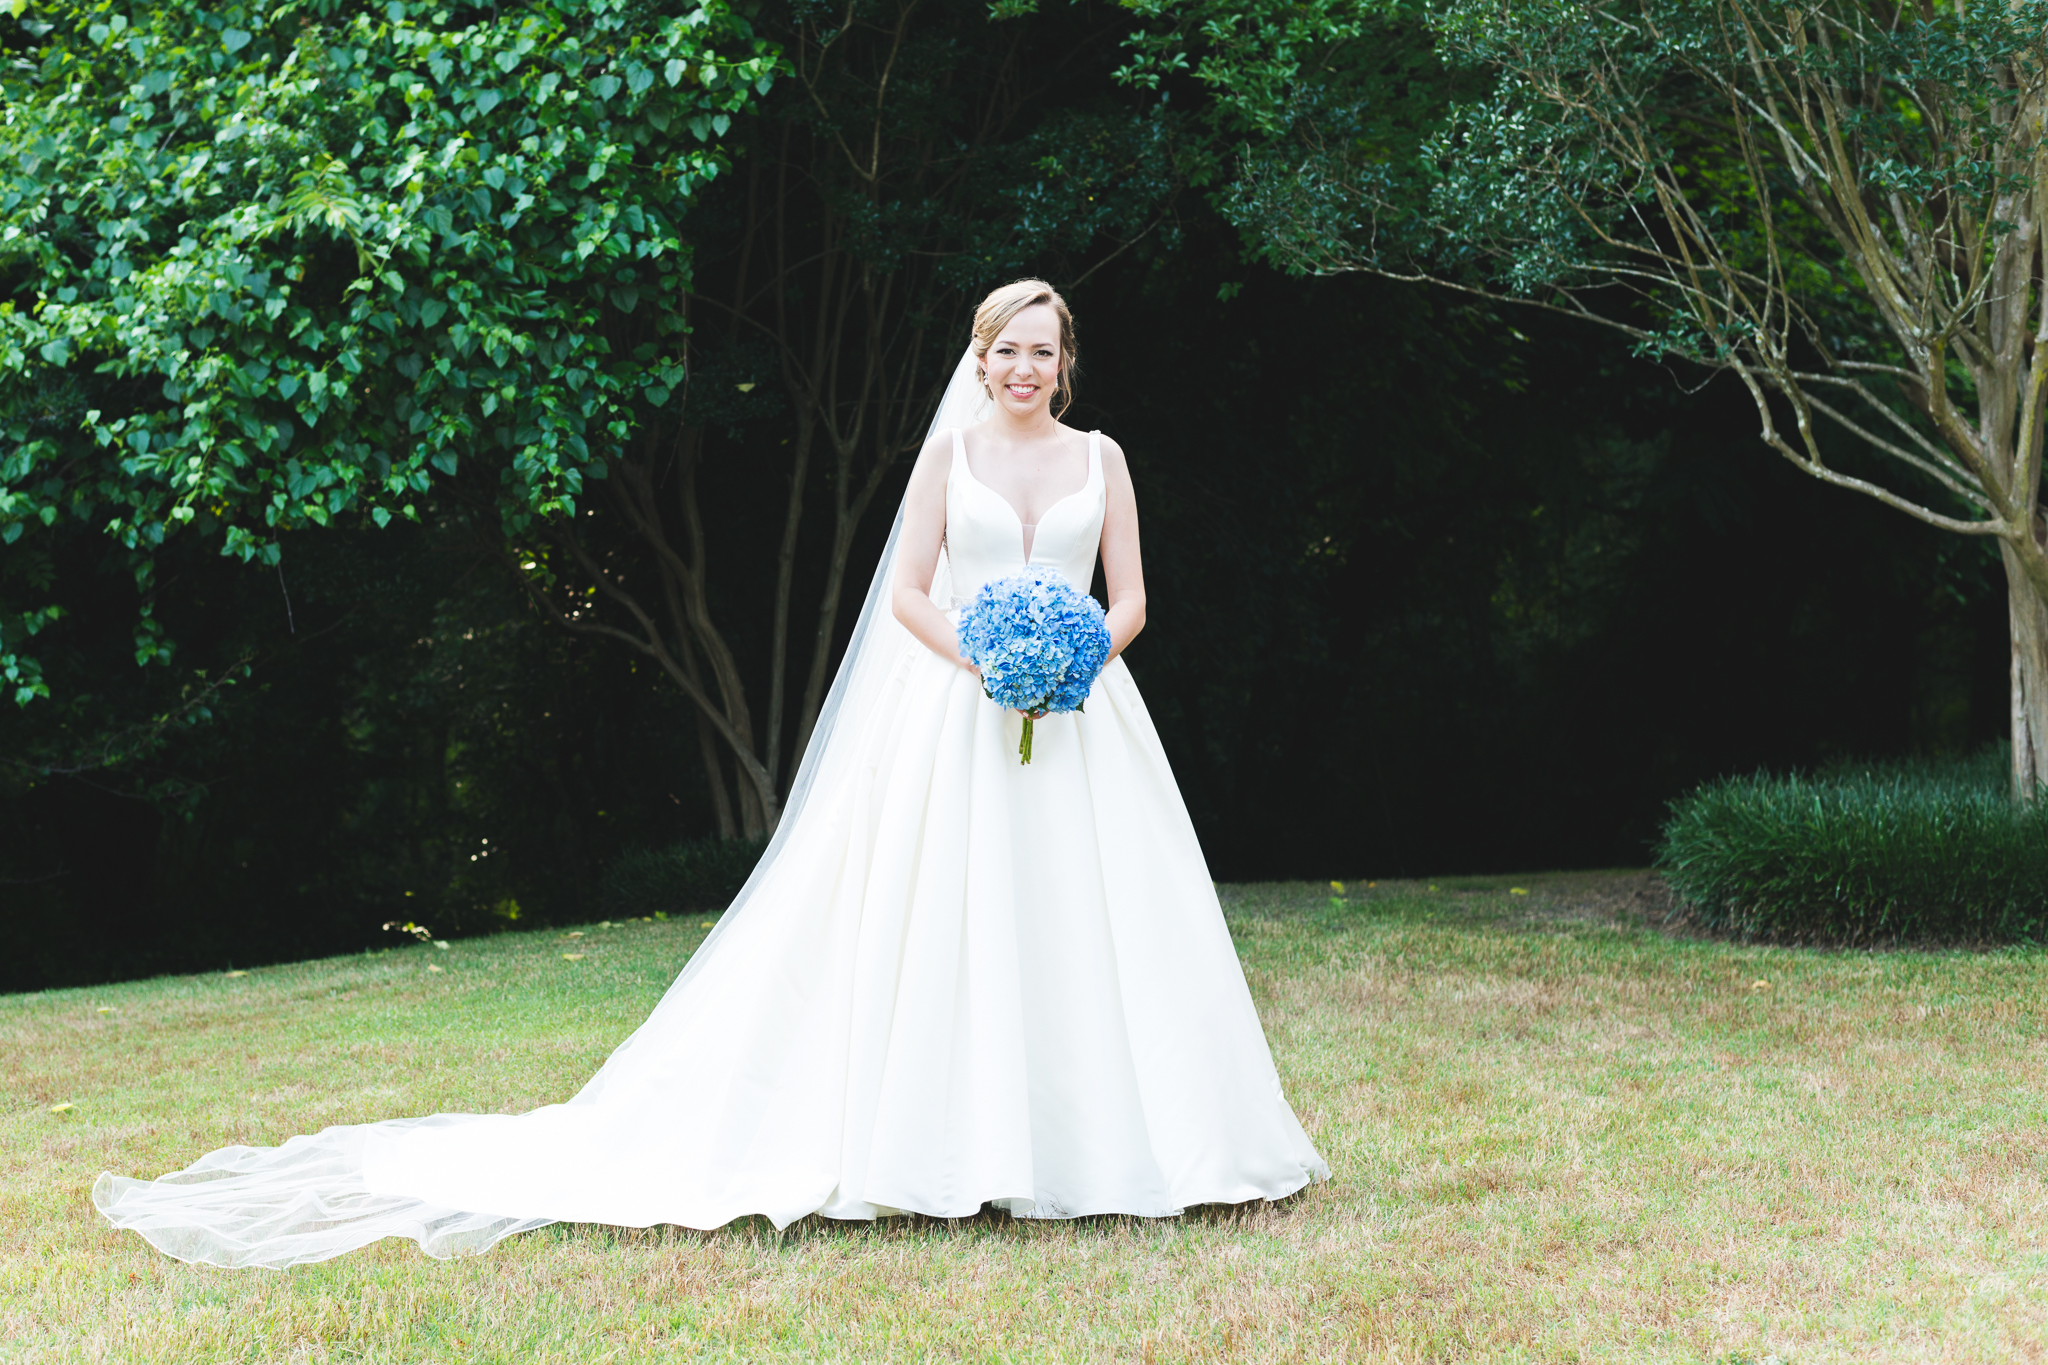 Bridals_MadisonReke_Blog-7.jpg